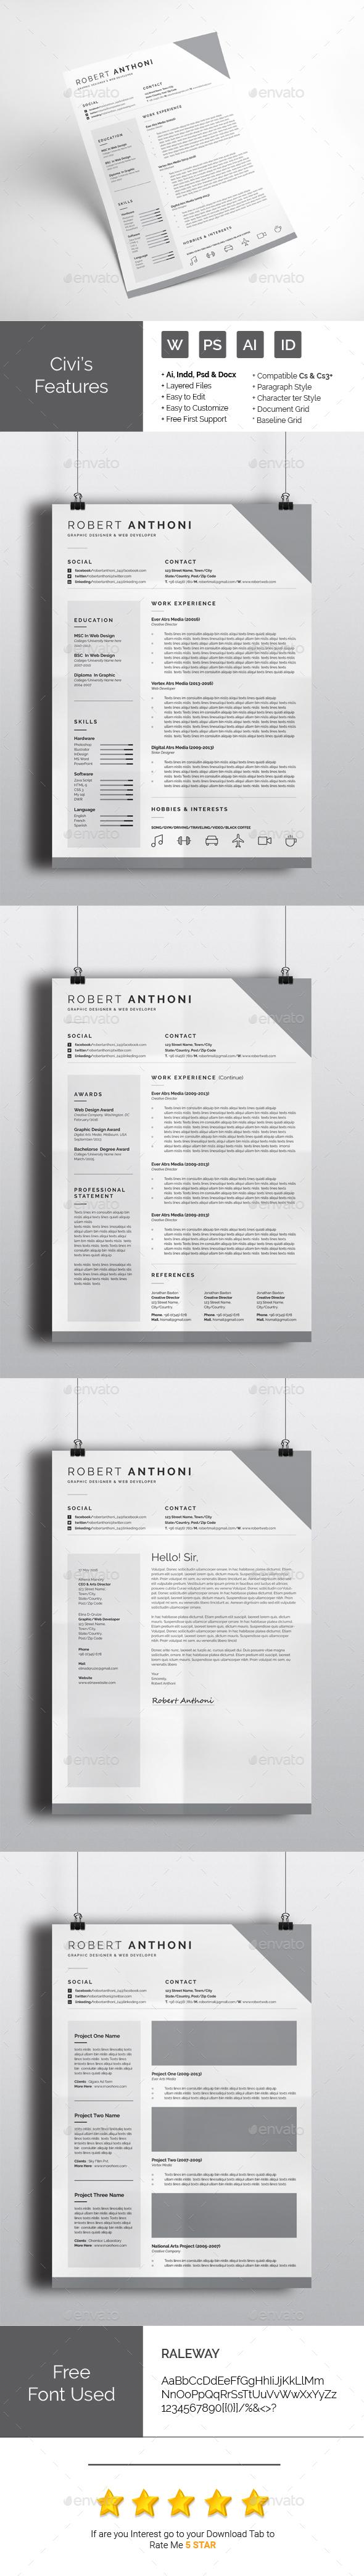 Creative CV Design Idea - Resumes Stationery Template InDesign INDD ...